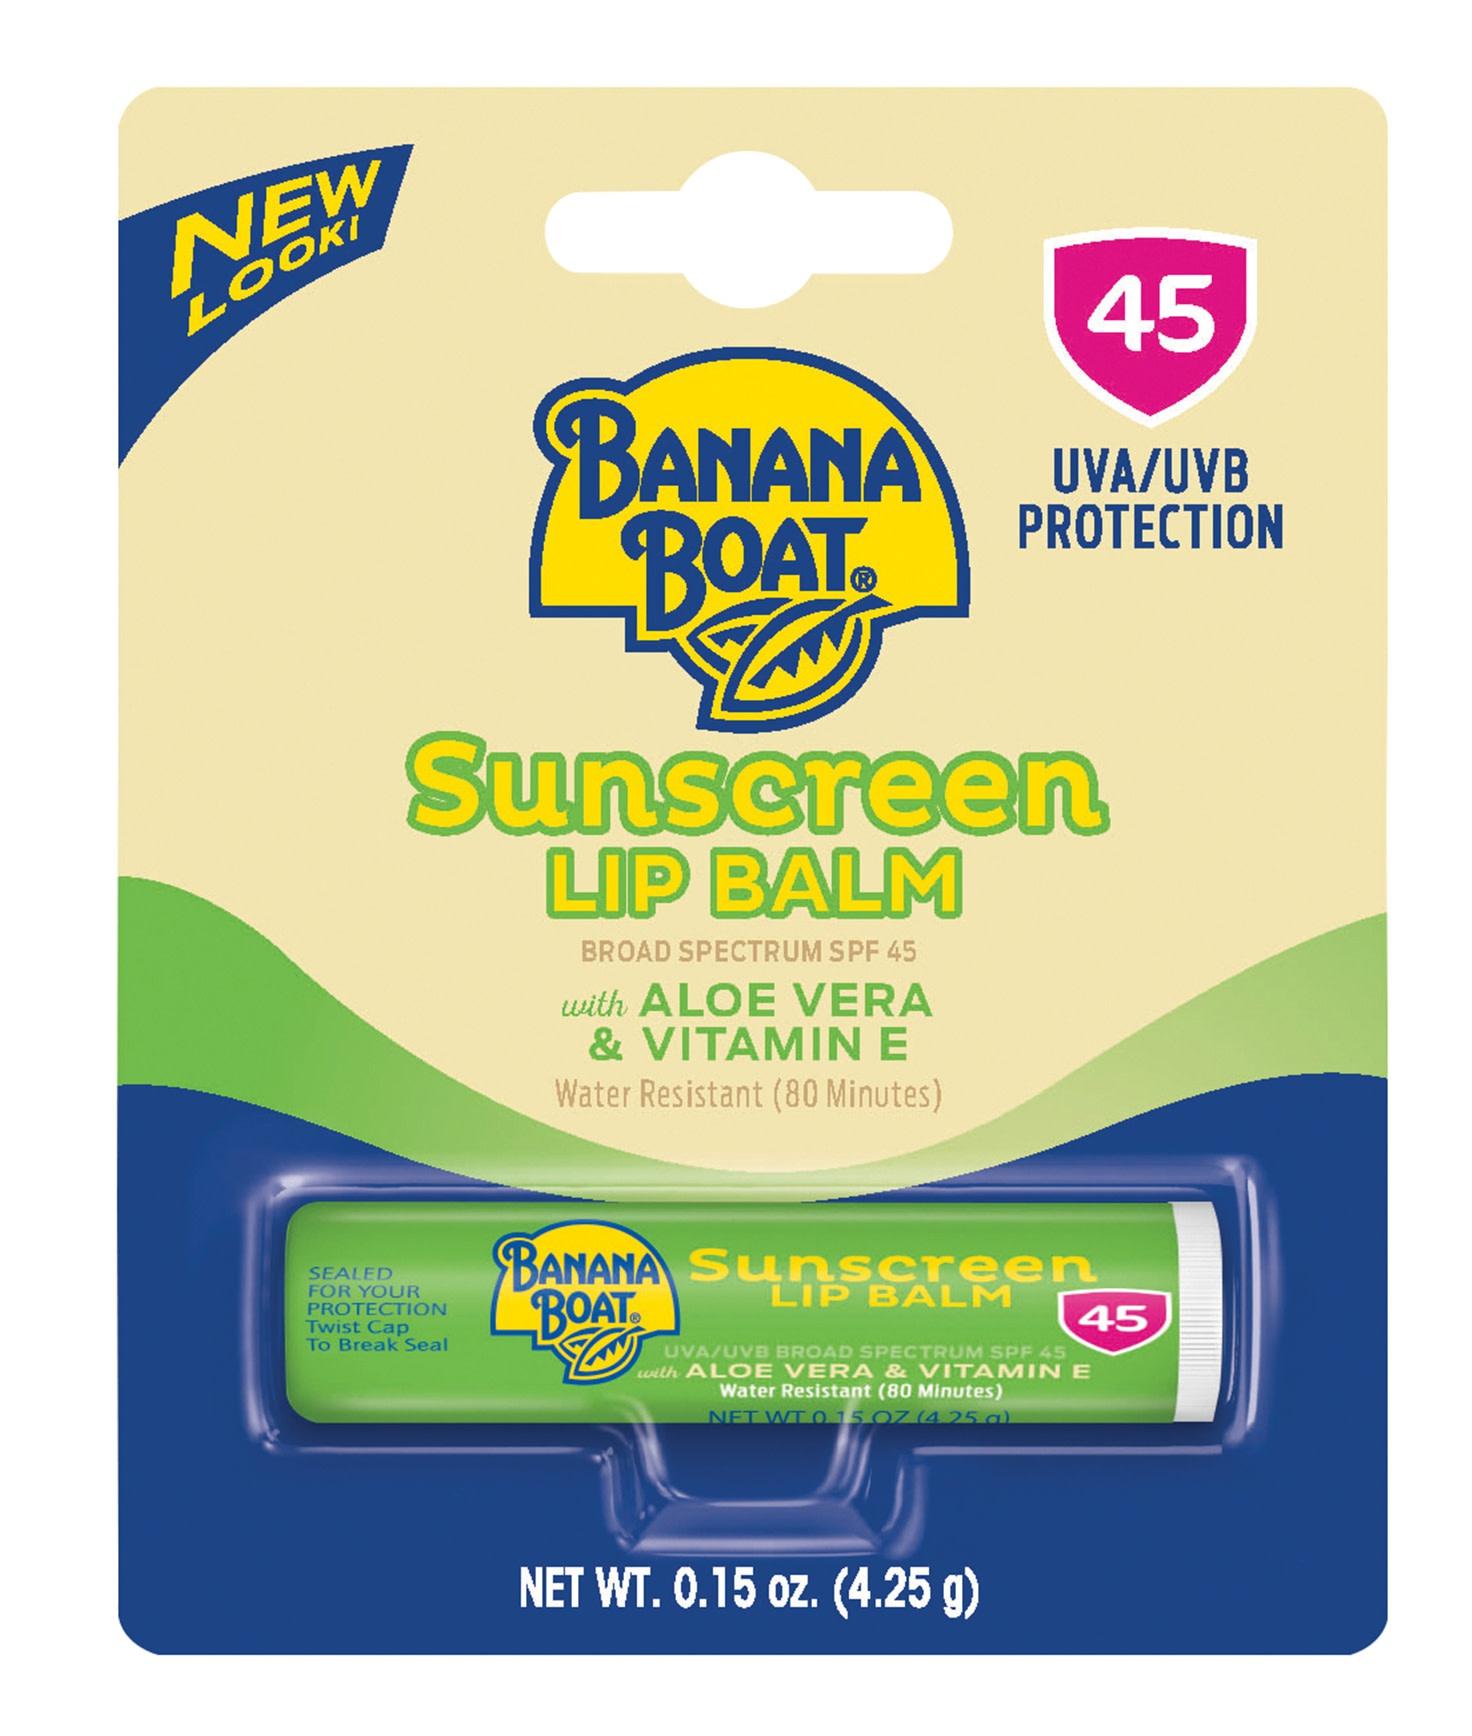 Banana Boat Unscreen Lip Balm Spf 45, Aloe Vera & Vitamin E